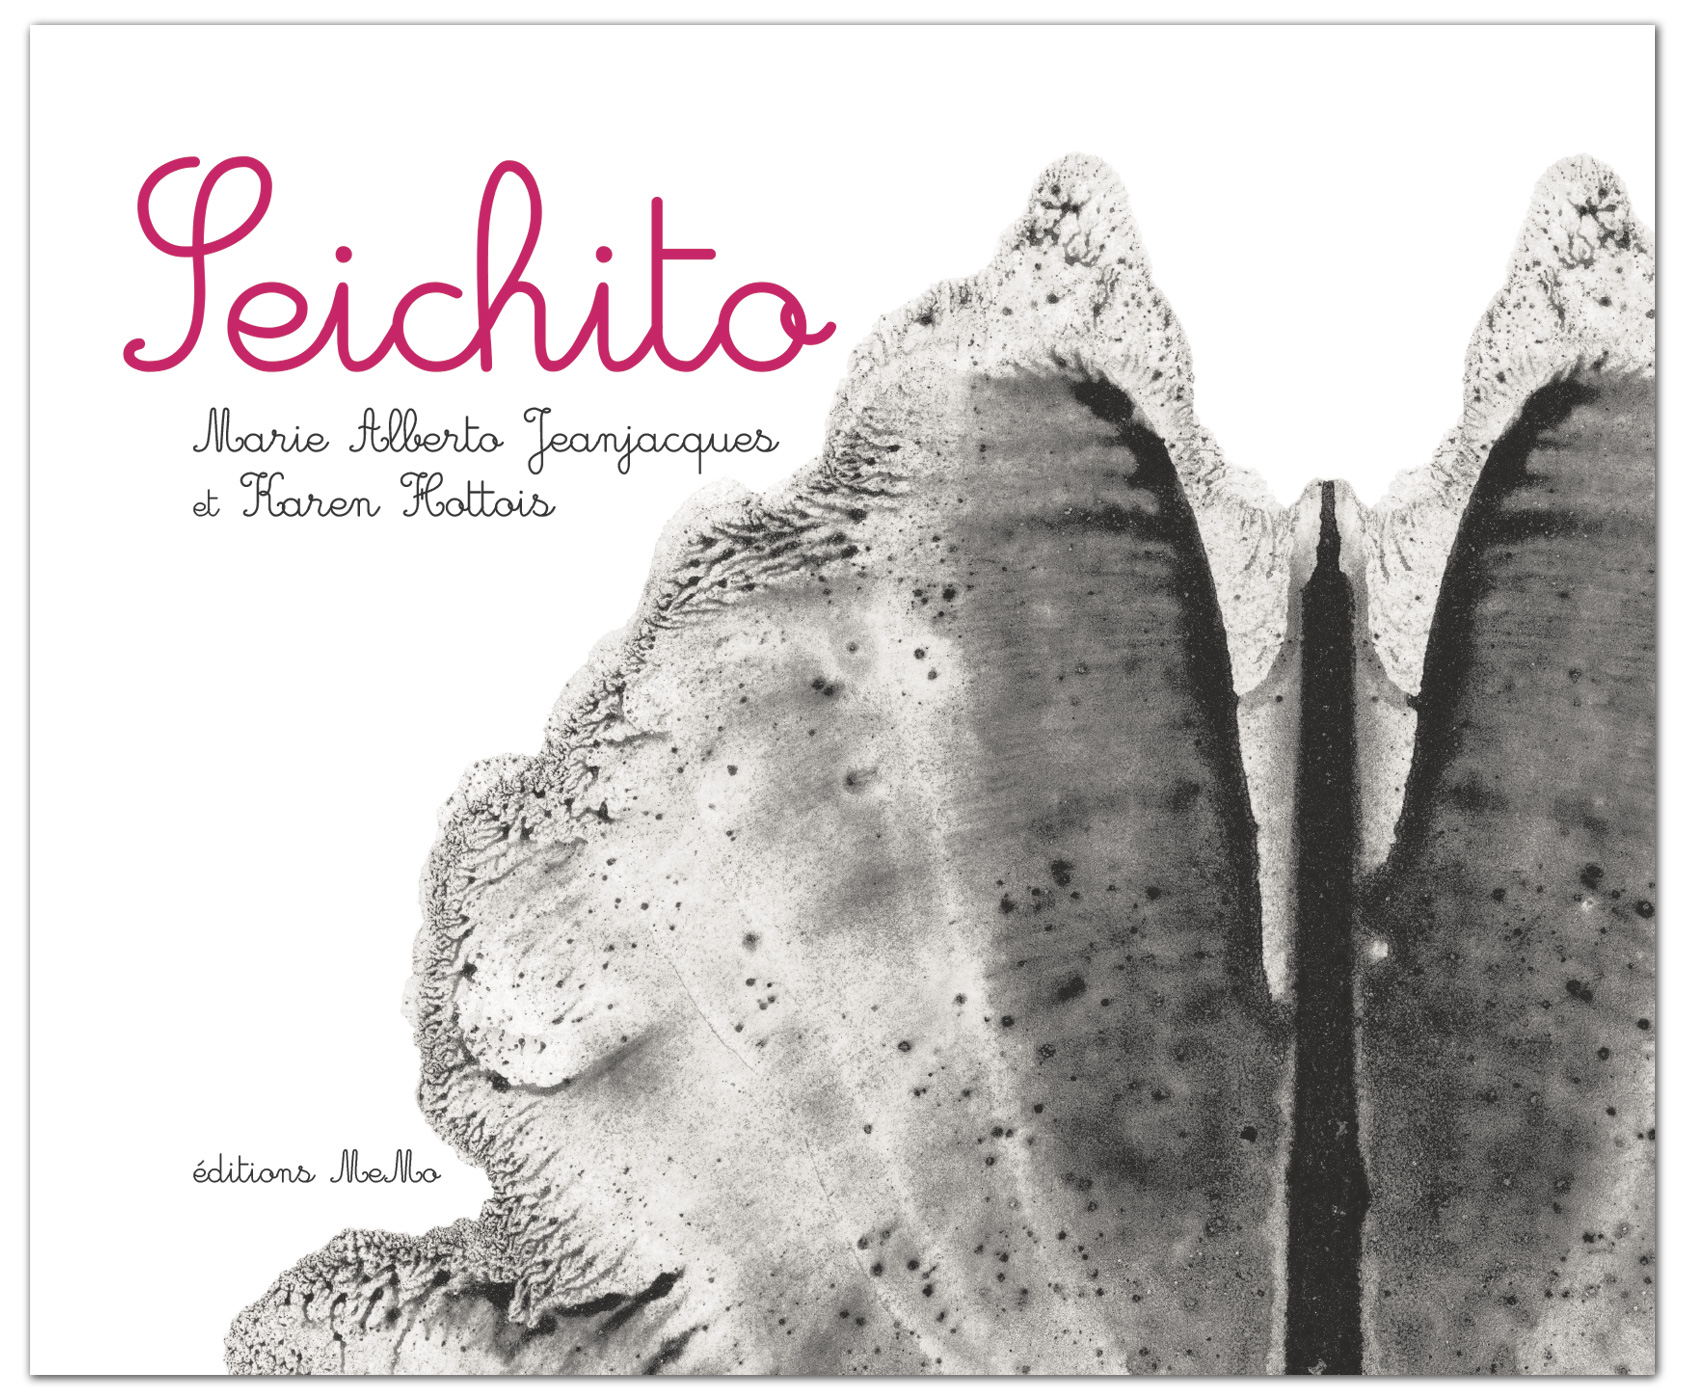 Seichito